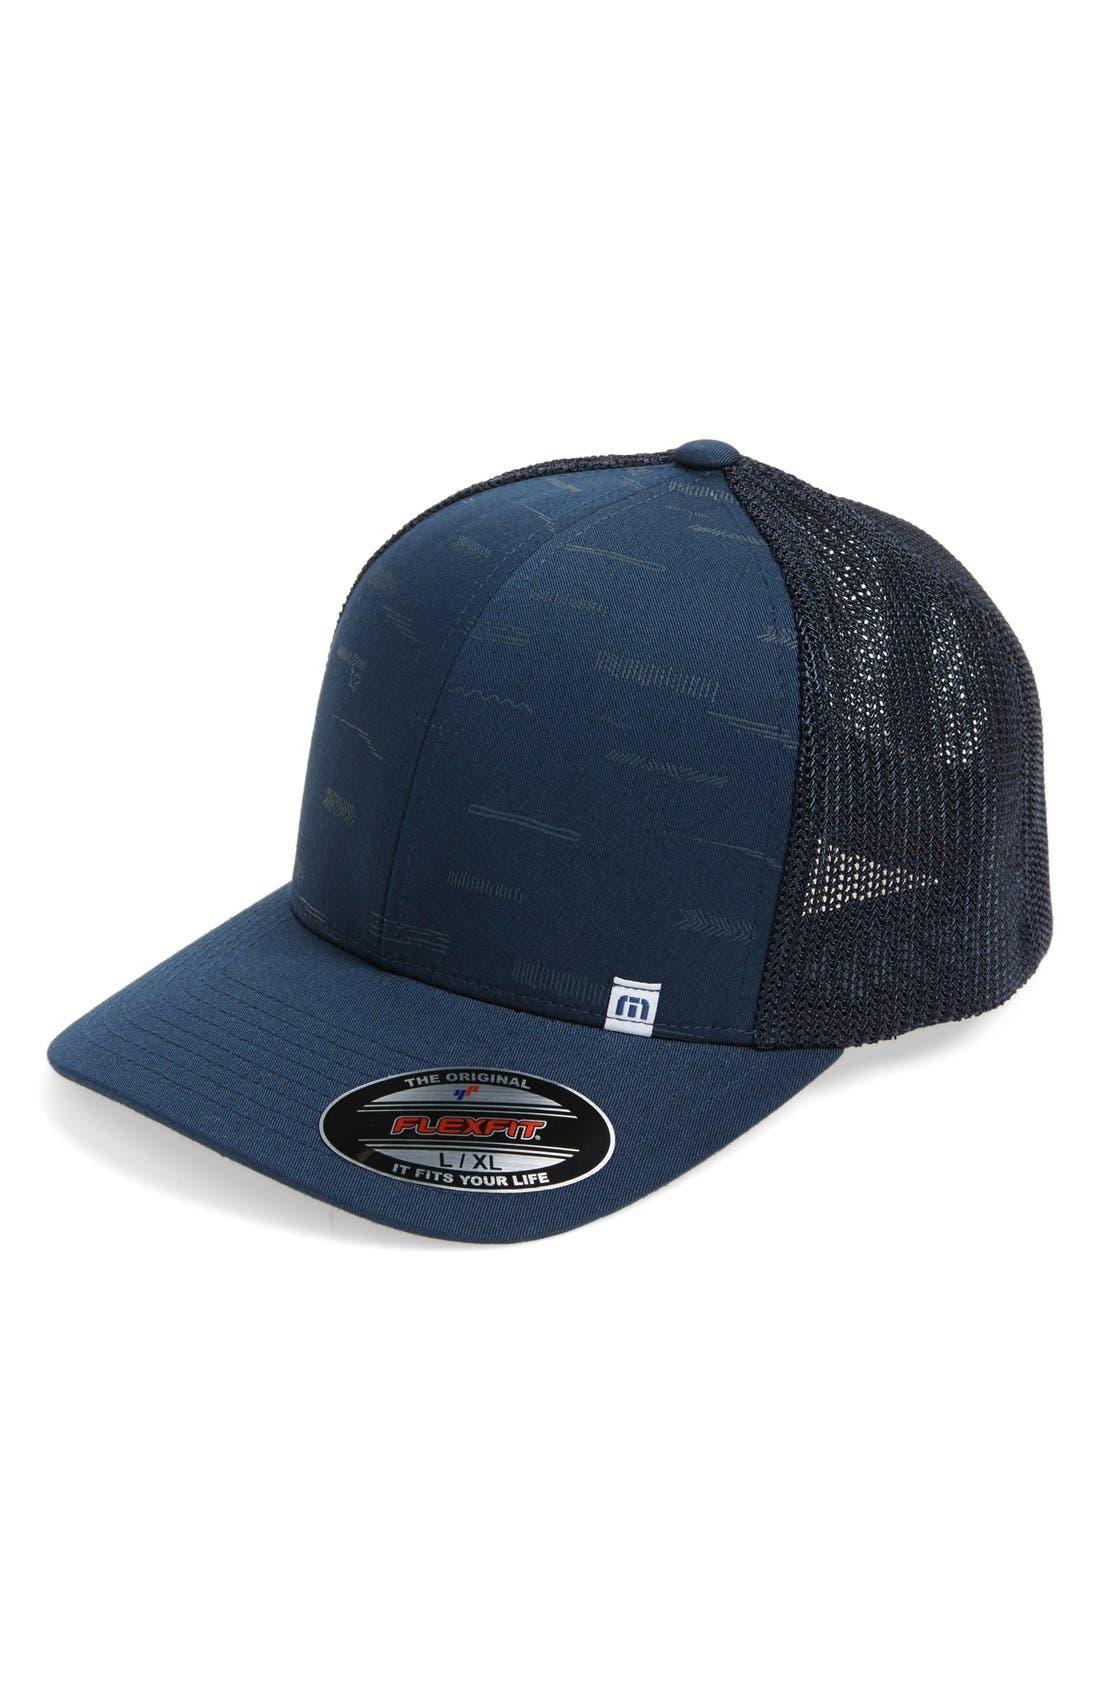 Alternate Image 1 Selected - Travis Mathew 'Absole' Trucker Hat